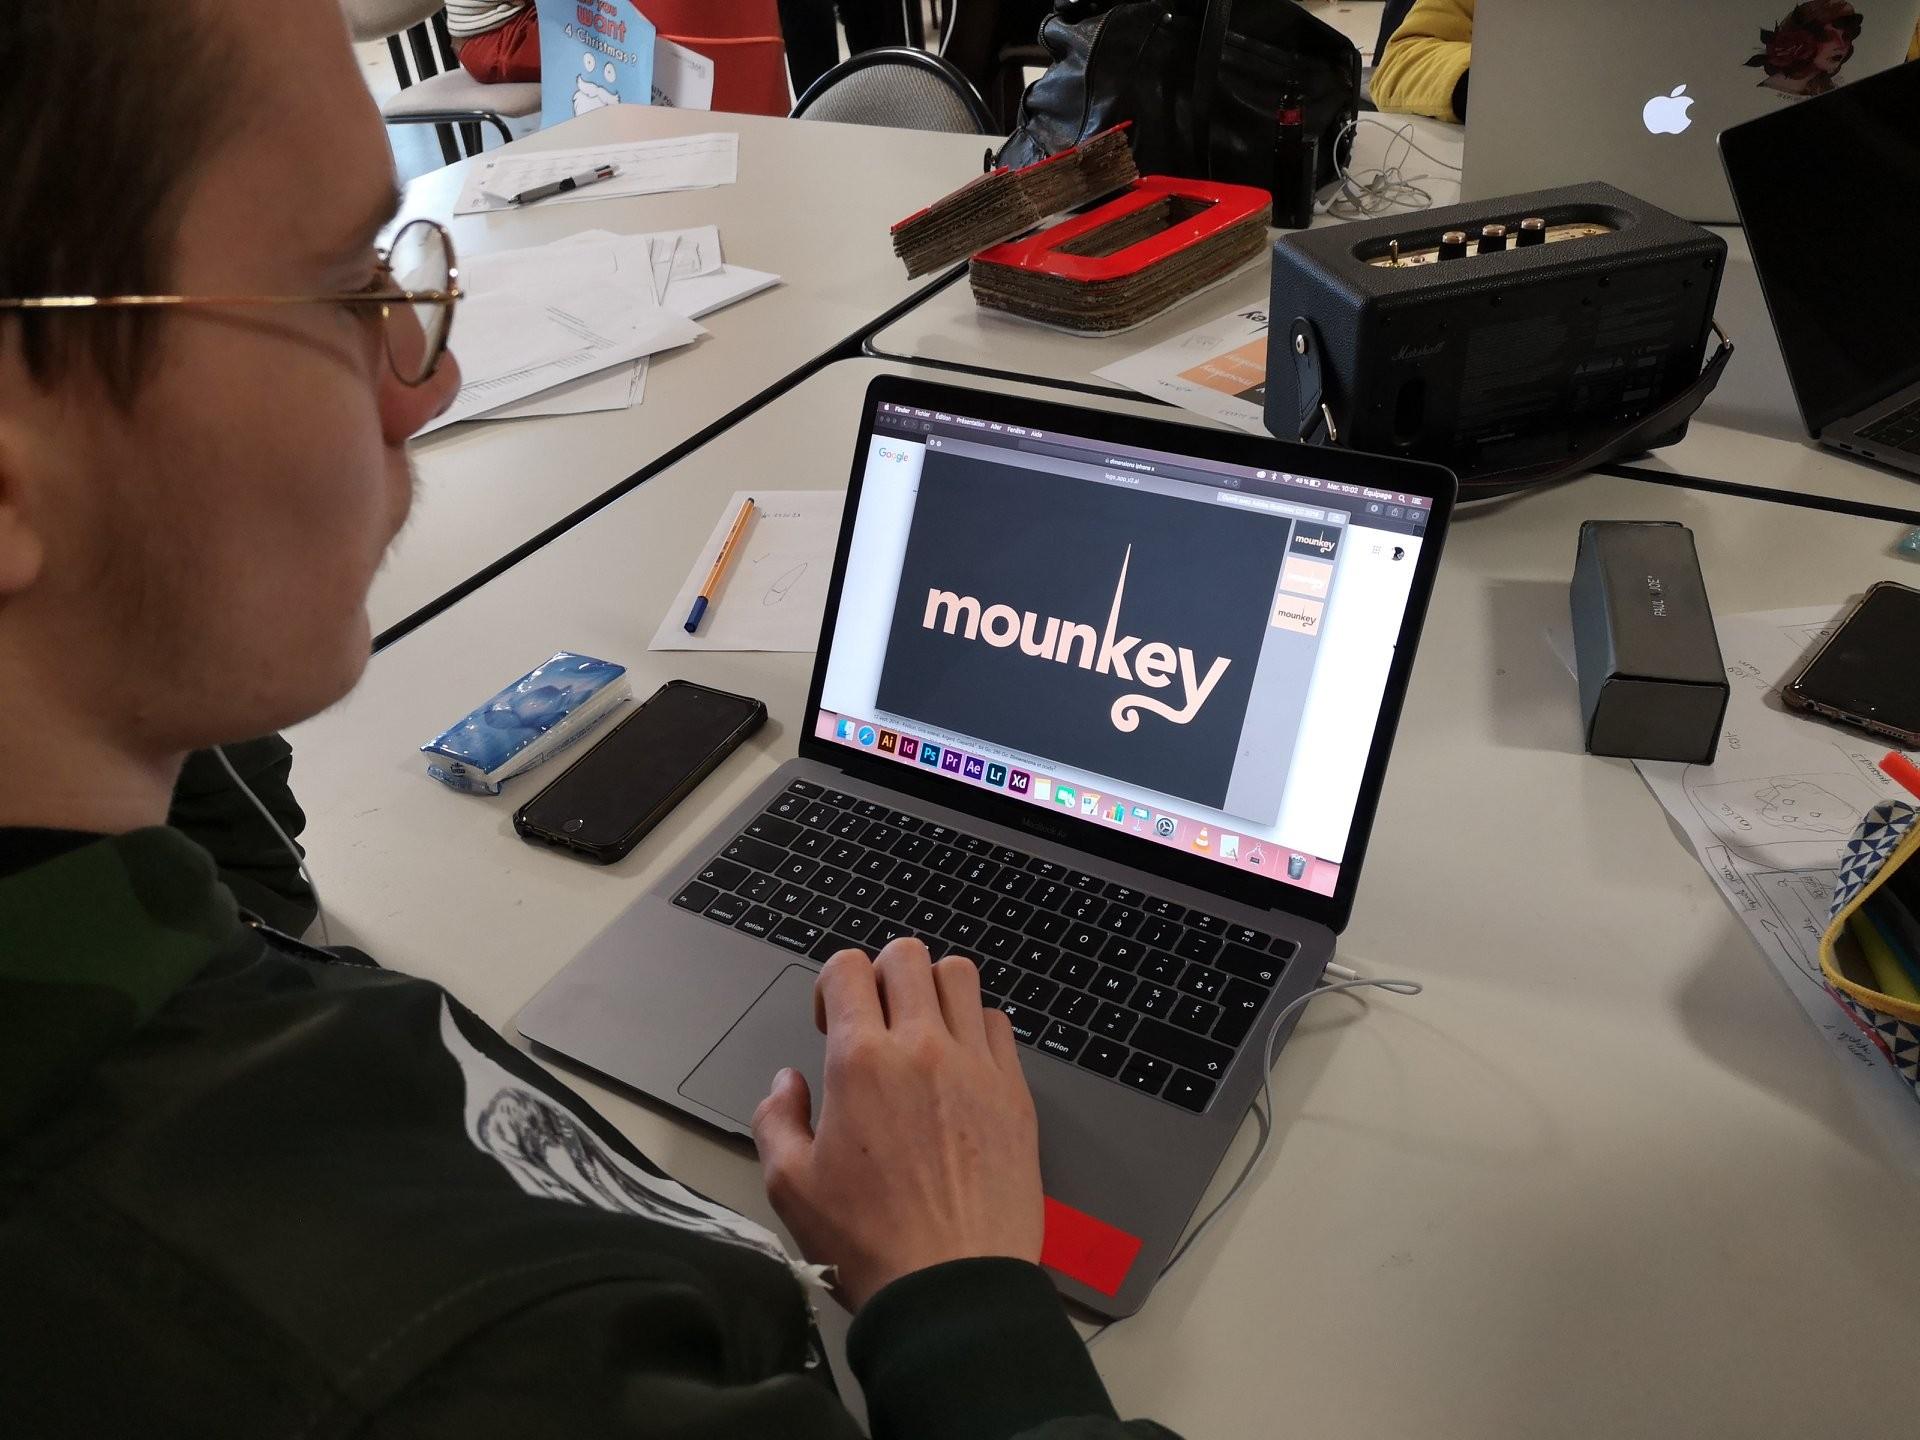 Design logo mounkey institut